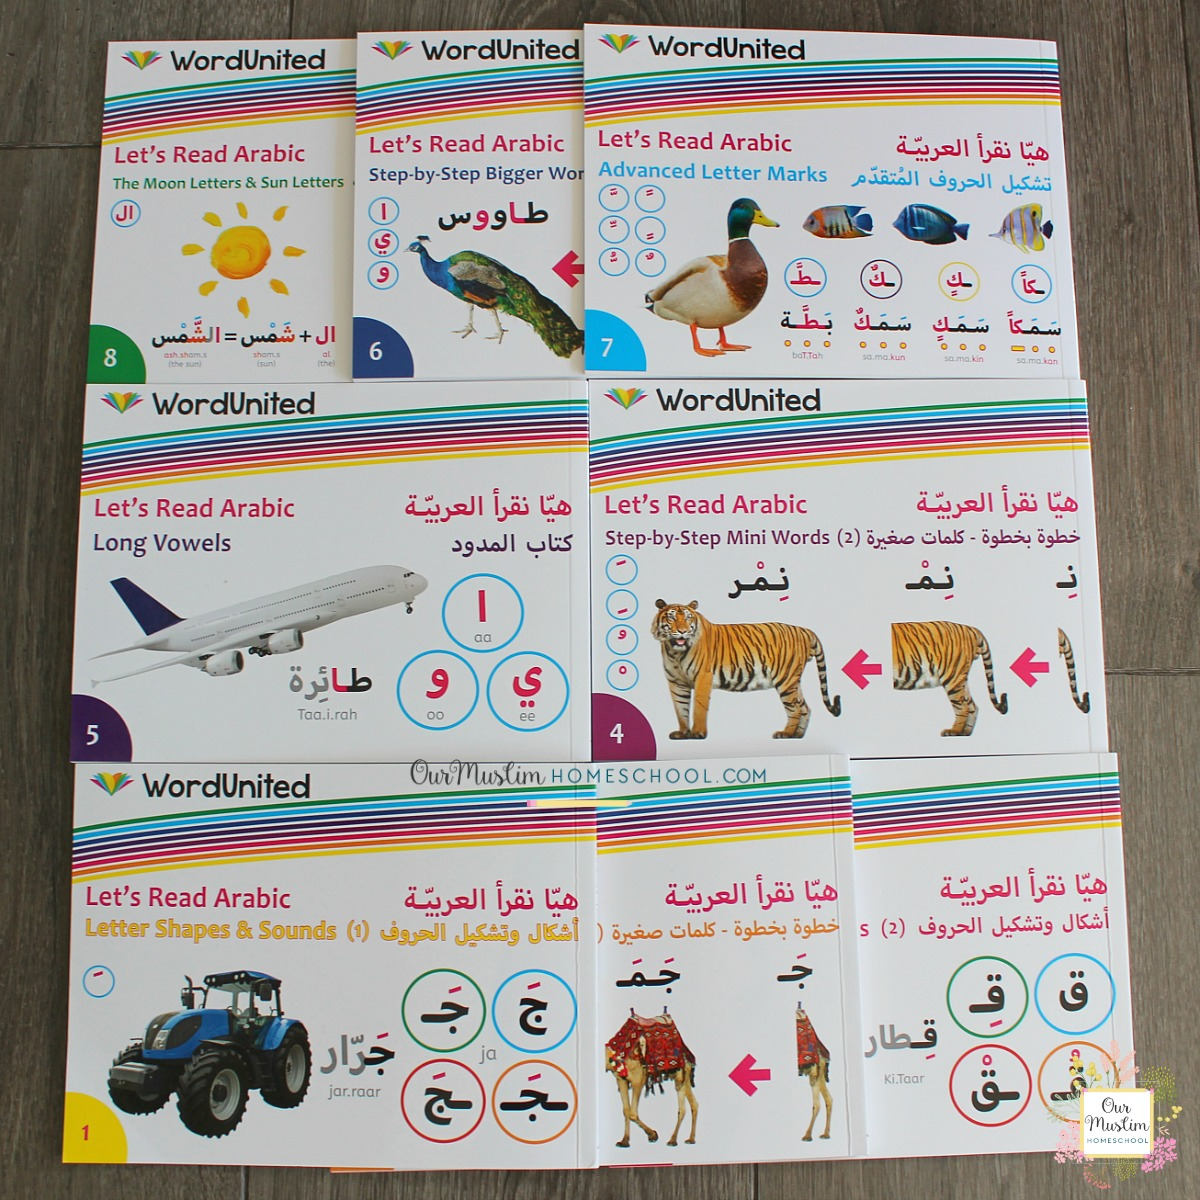 Let's Read Arabic WordUnited